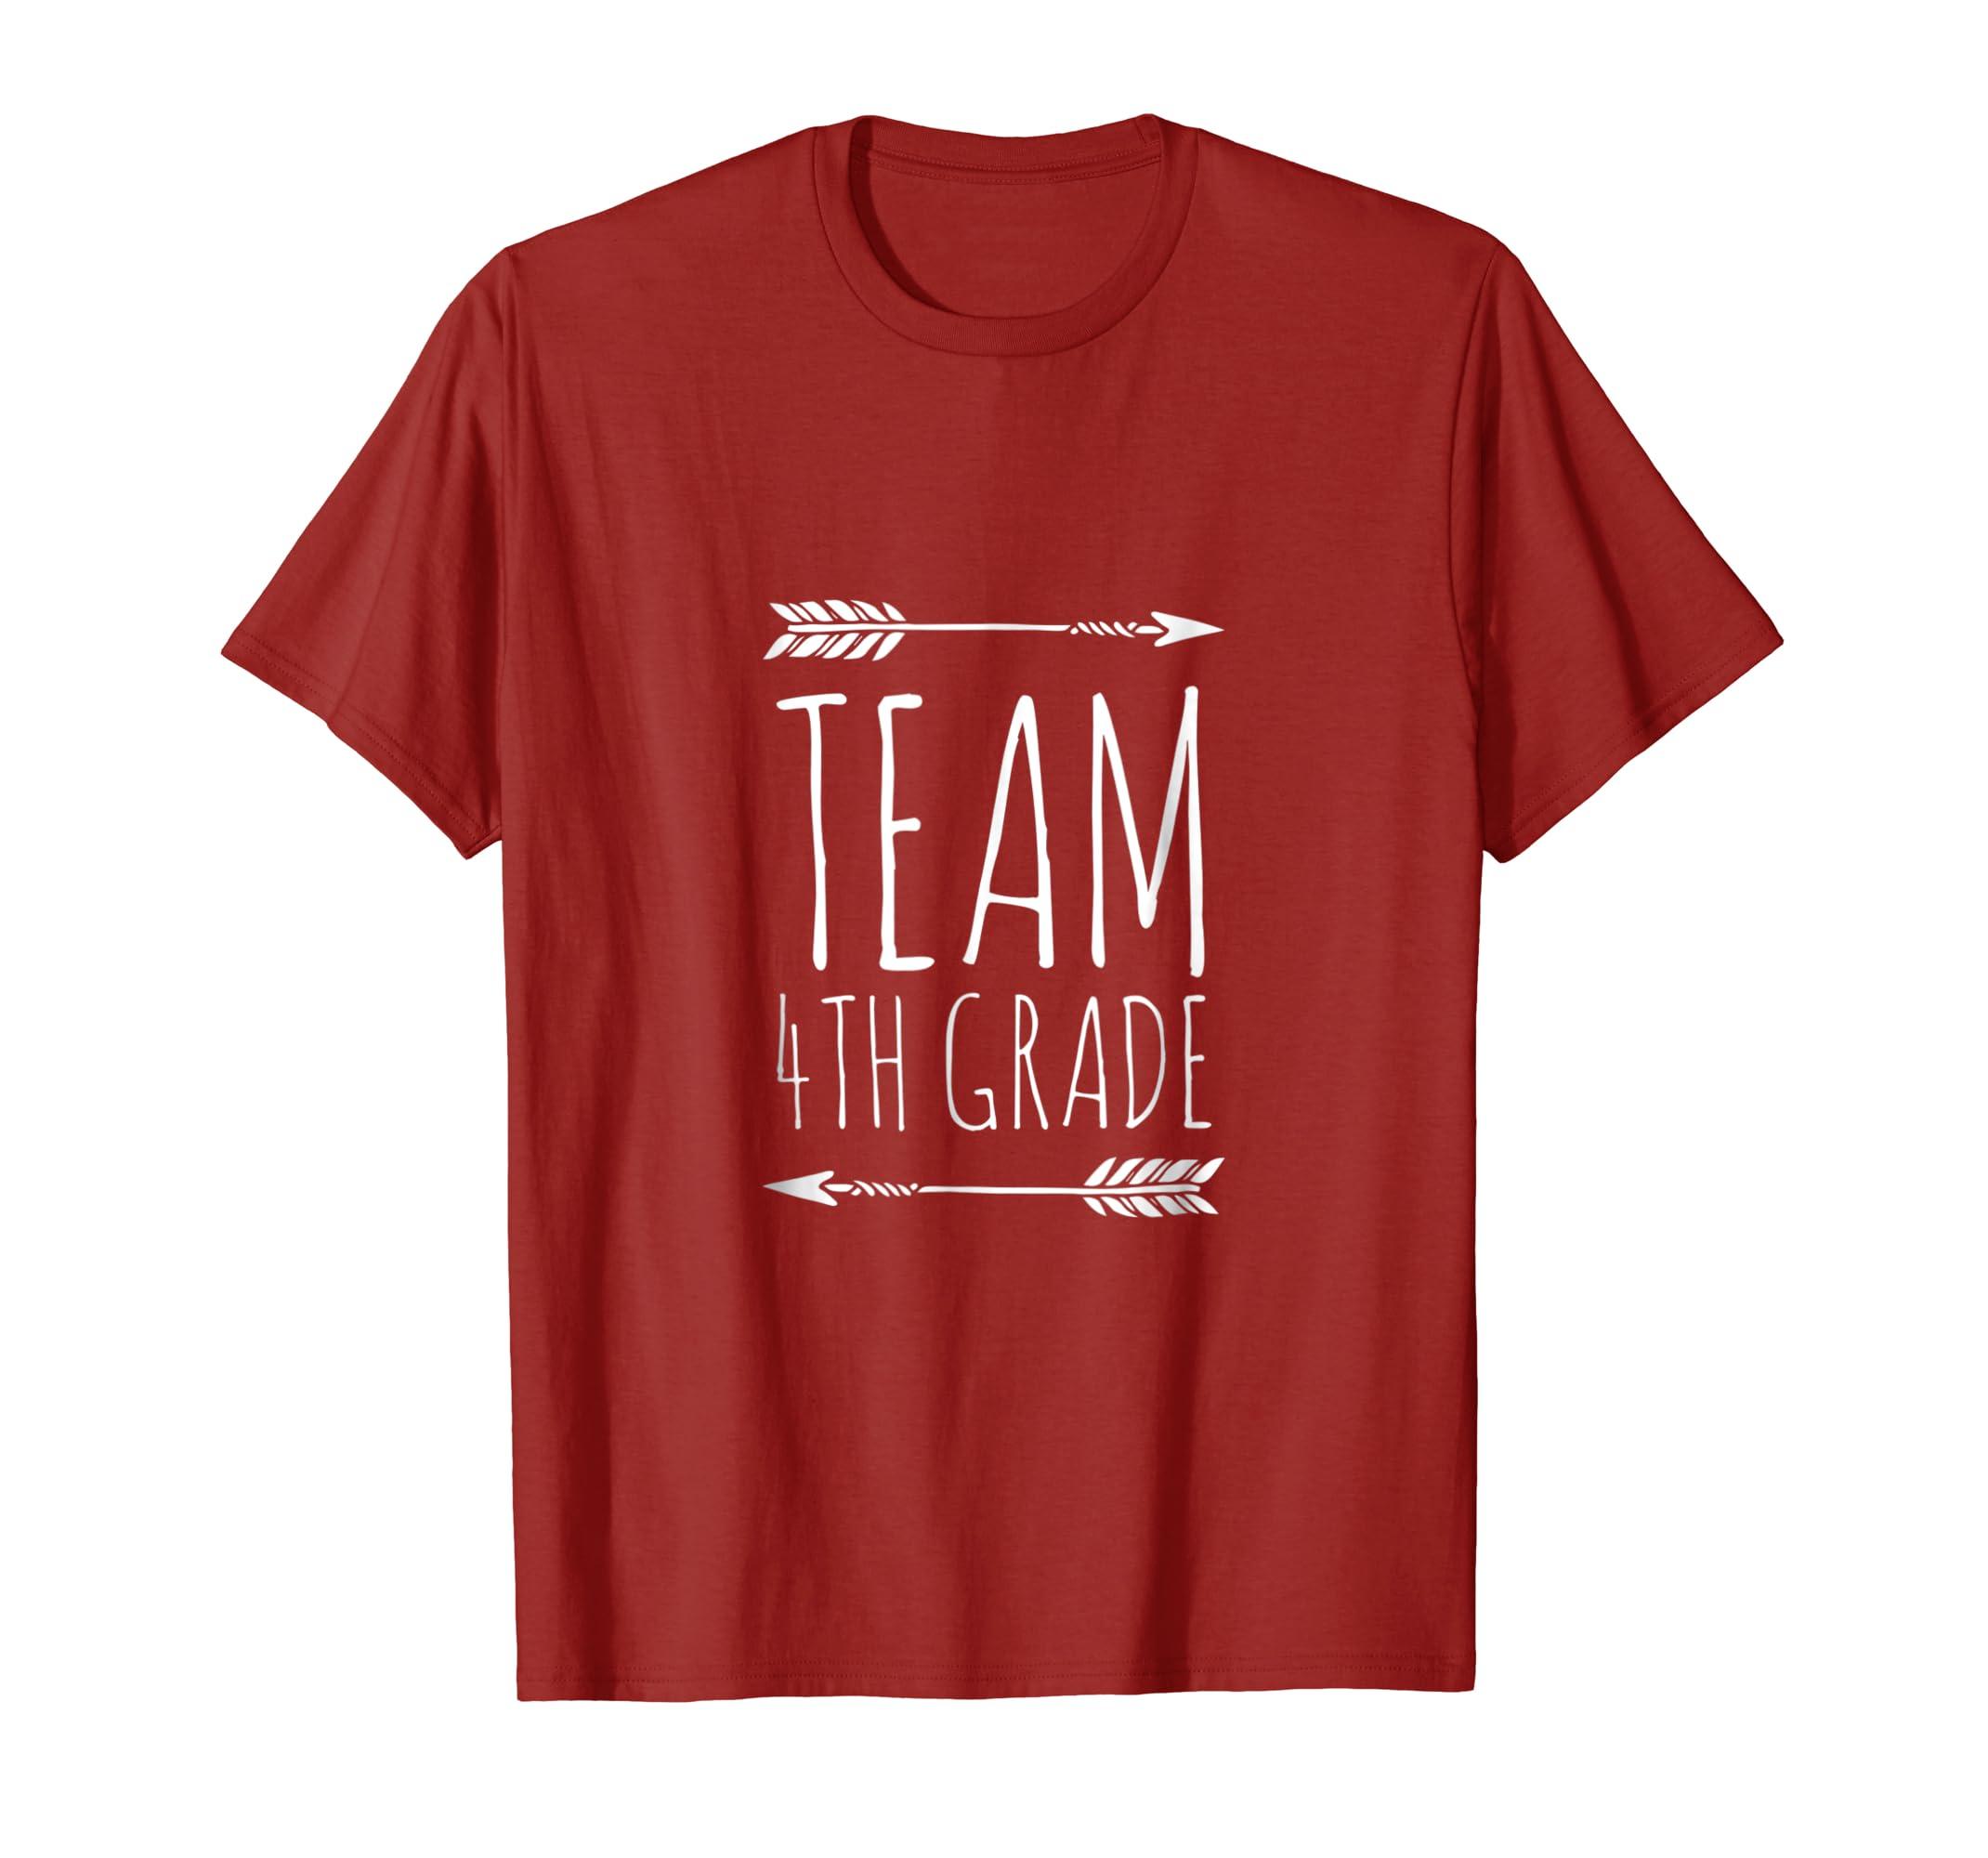 4th Grade Shirt Boys Team Back to School Son Fourth Grader